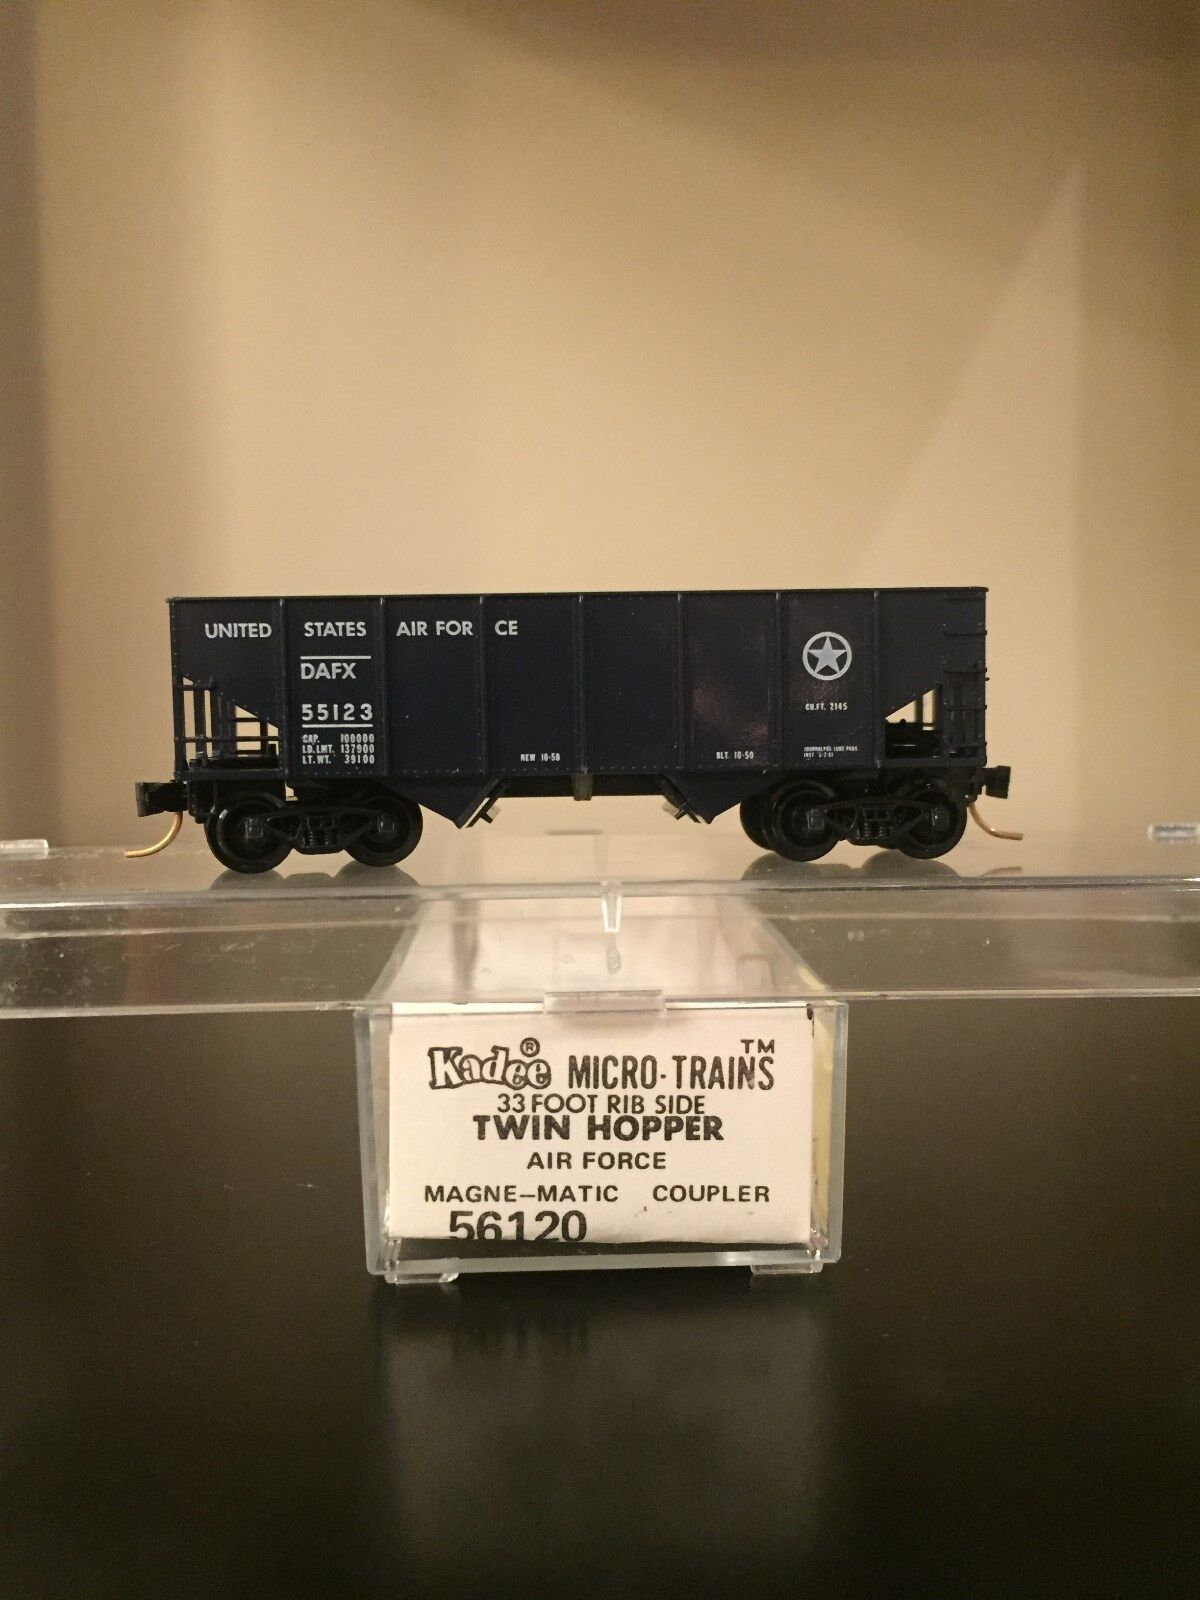 Kadee Micro Trains MTL 56120 Air Force DAFX 55123 USAF  33' Twin Hopper